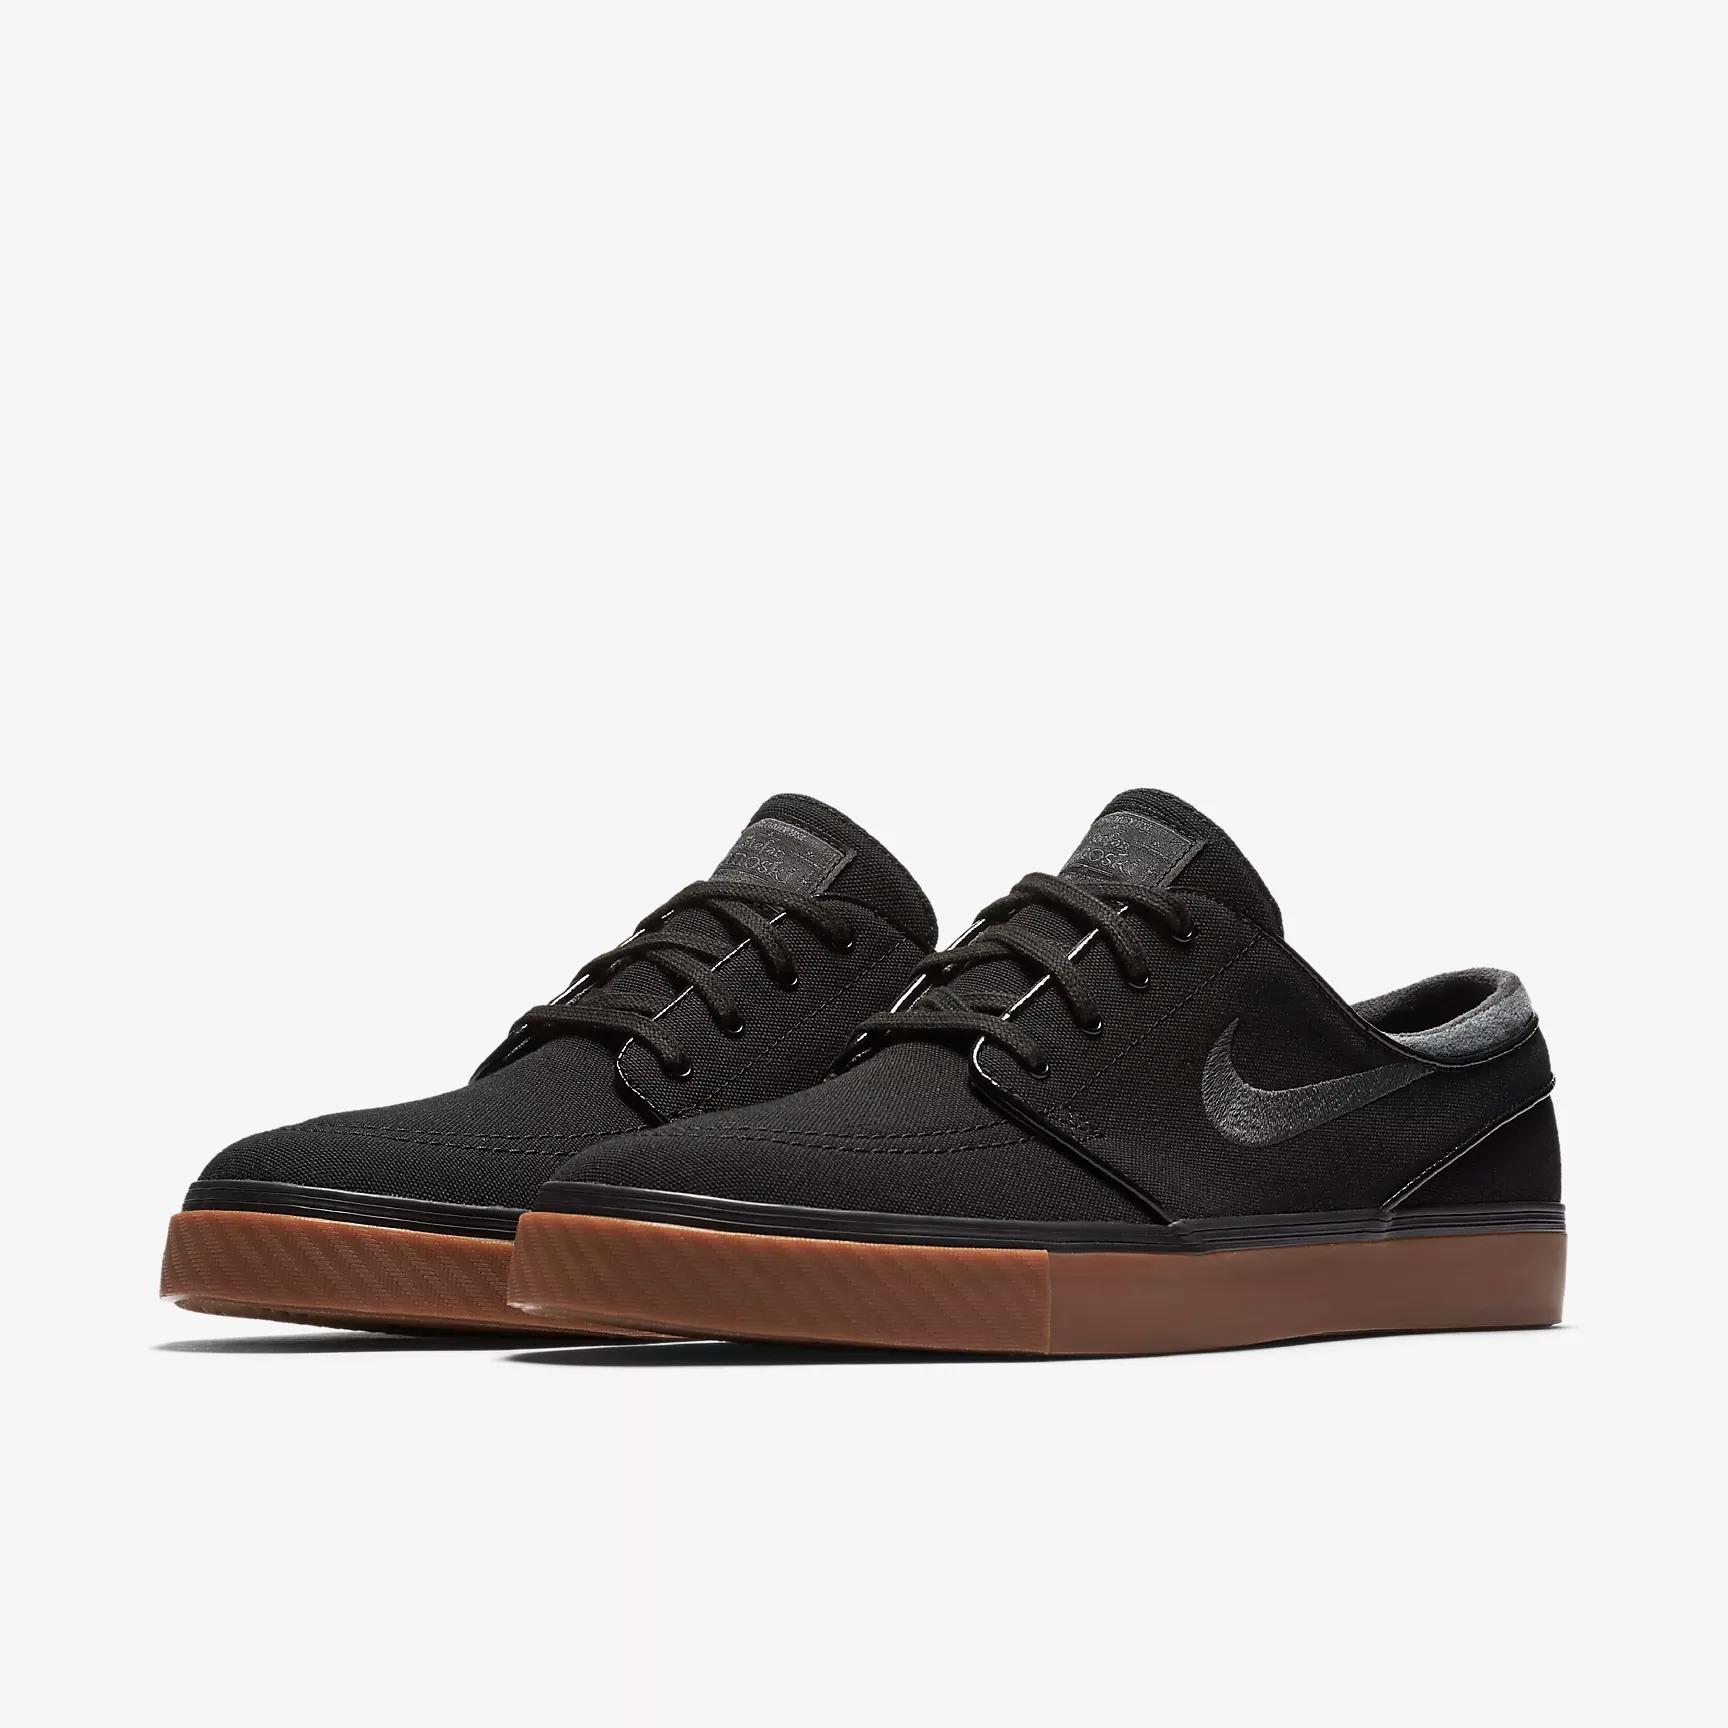 9519efe773e8 Nike SB Zoom Stefan Janoski Canvas Skateboarding Shoes - SPORT SHOES  Lifestyle Shoes